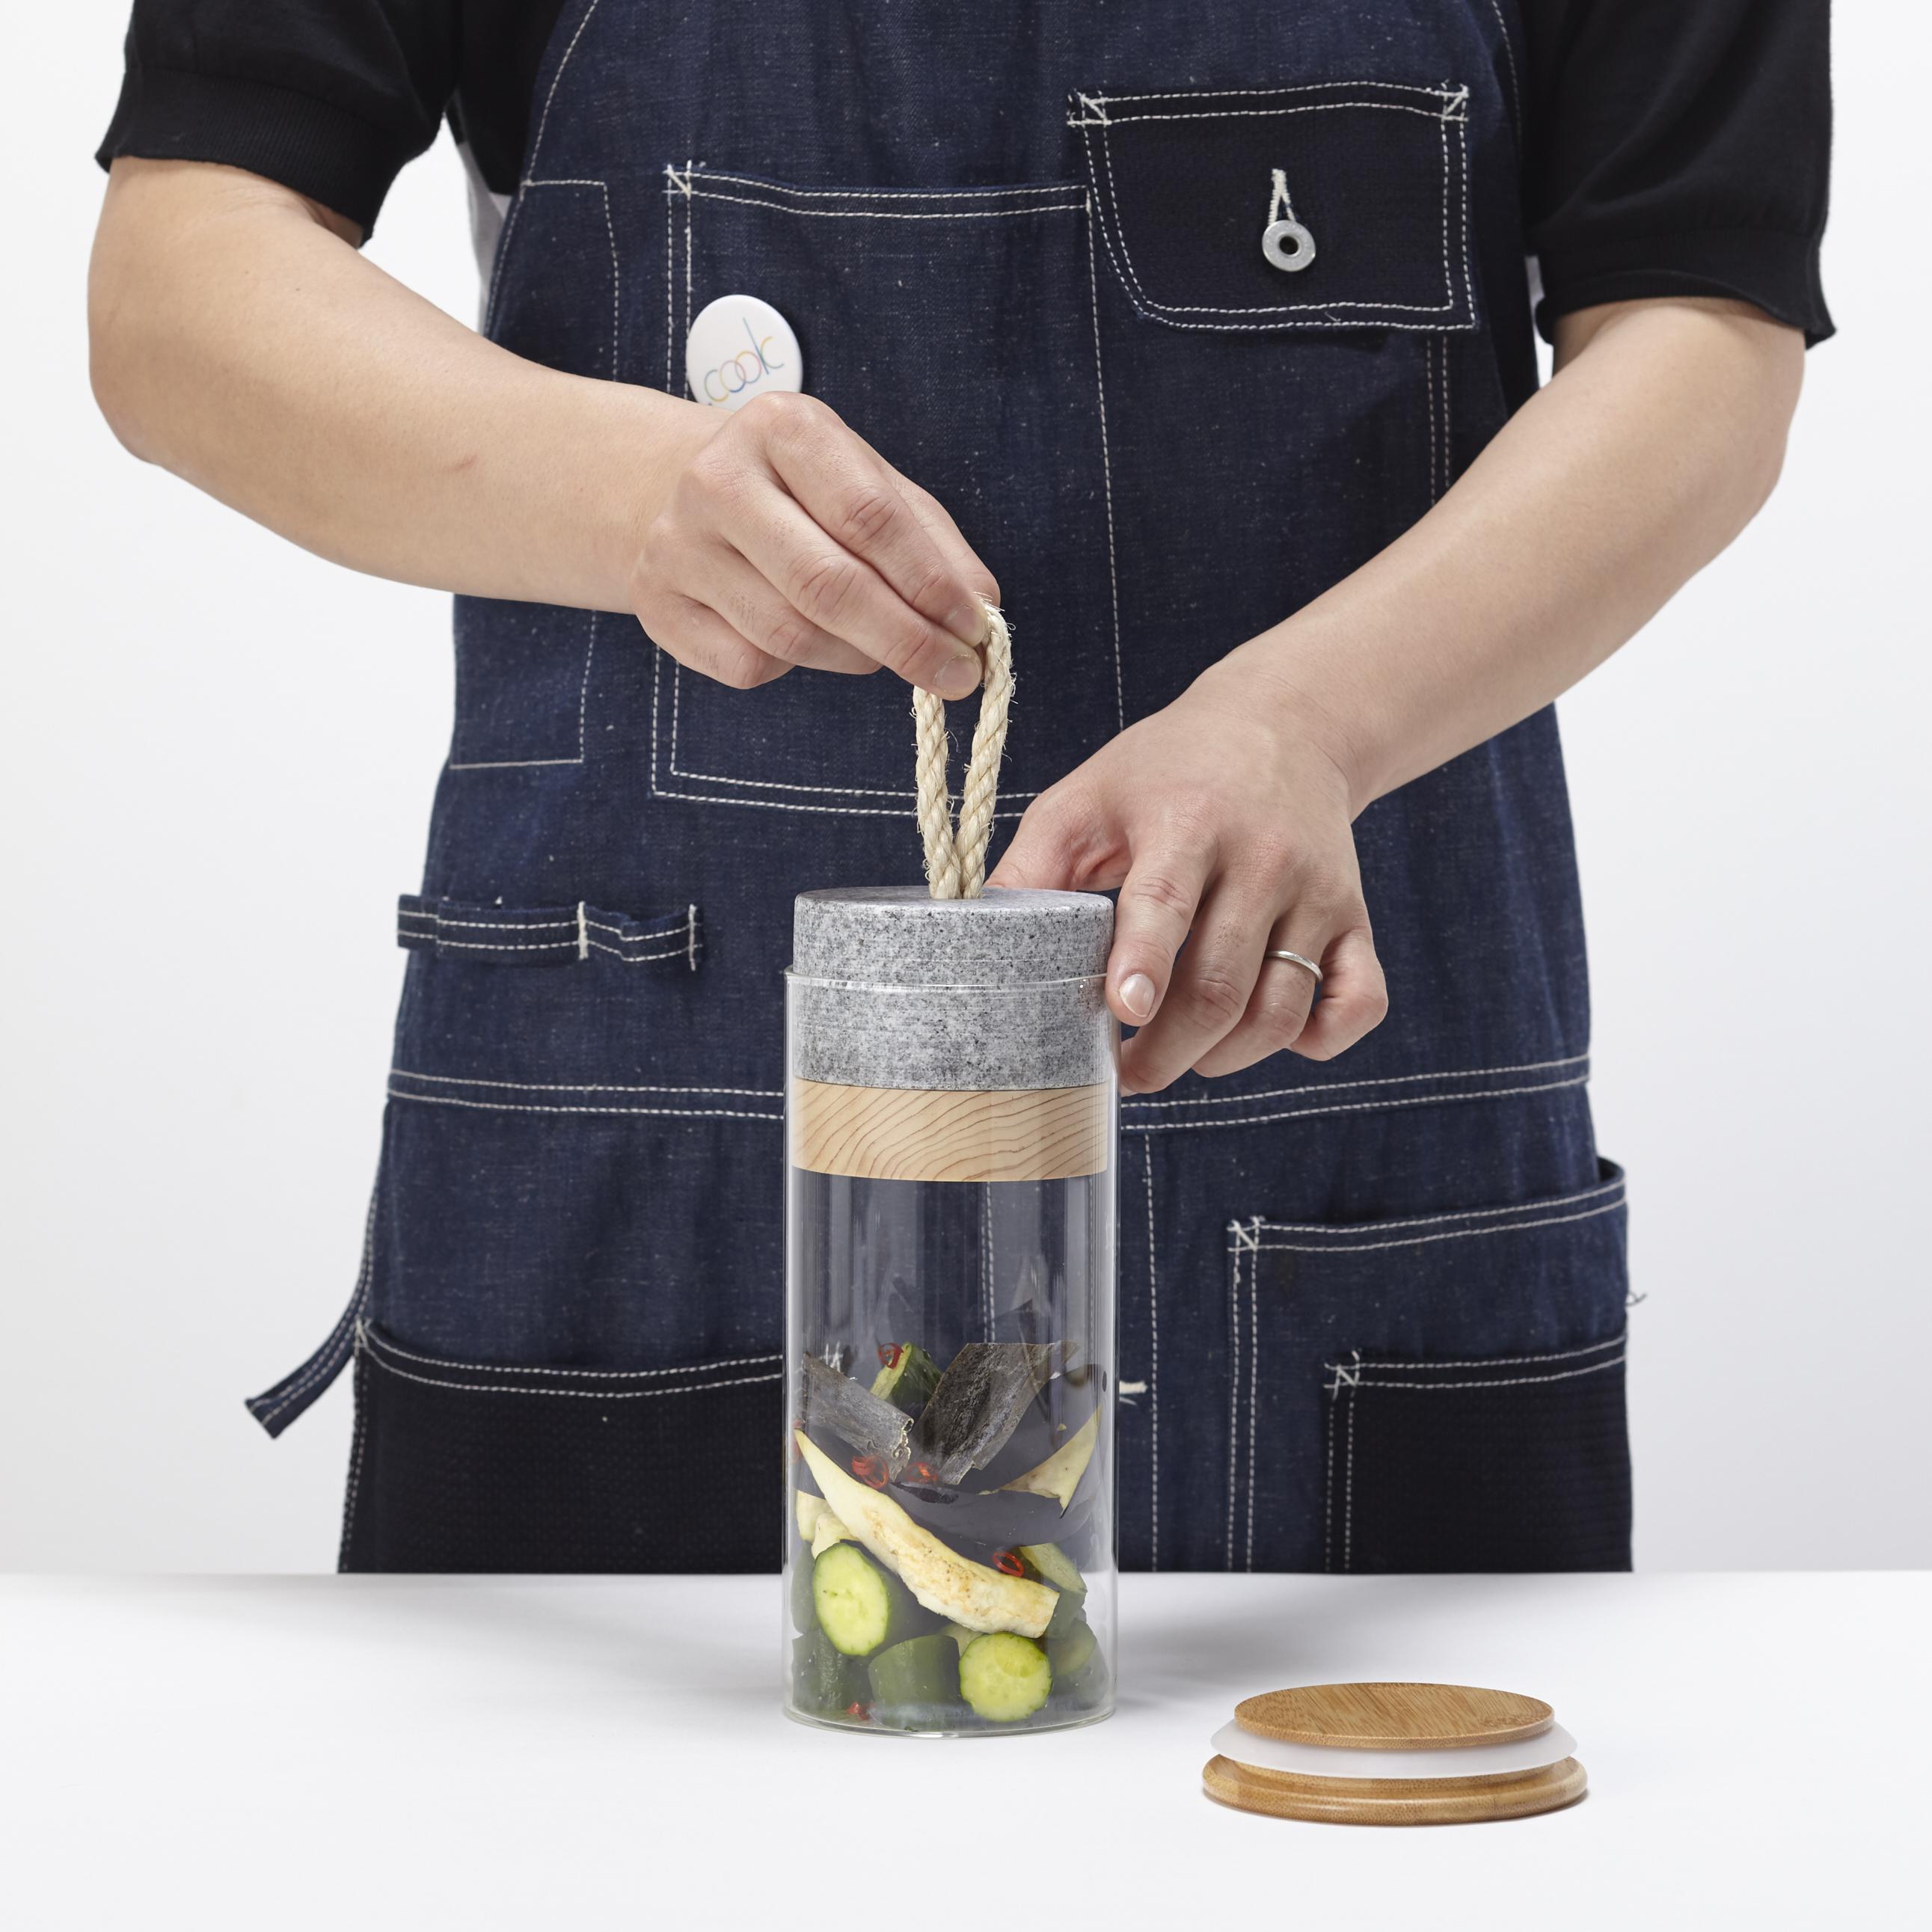 「Picklestone」の考案者である田中友規氏は、料理男子である彼が使いたい全く新しい漬物容器を作り上げた